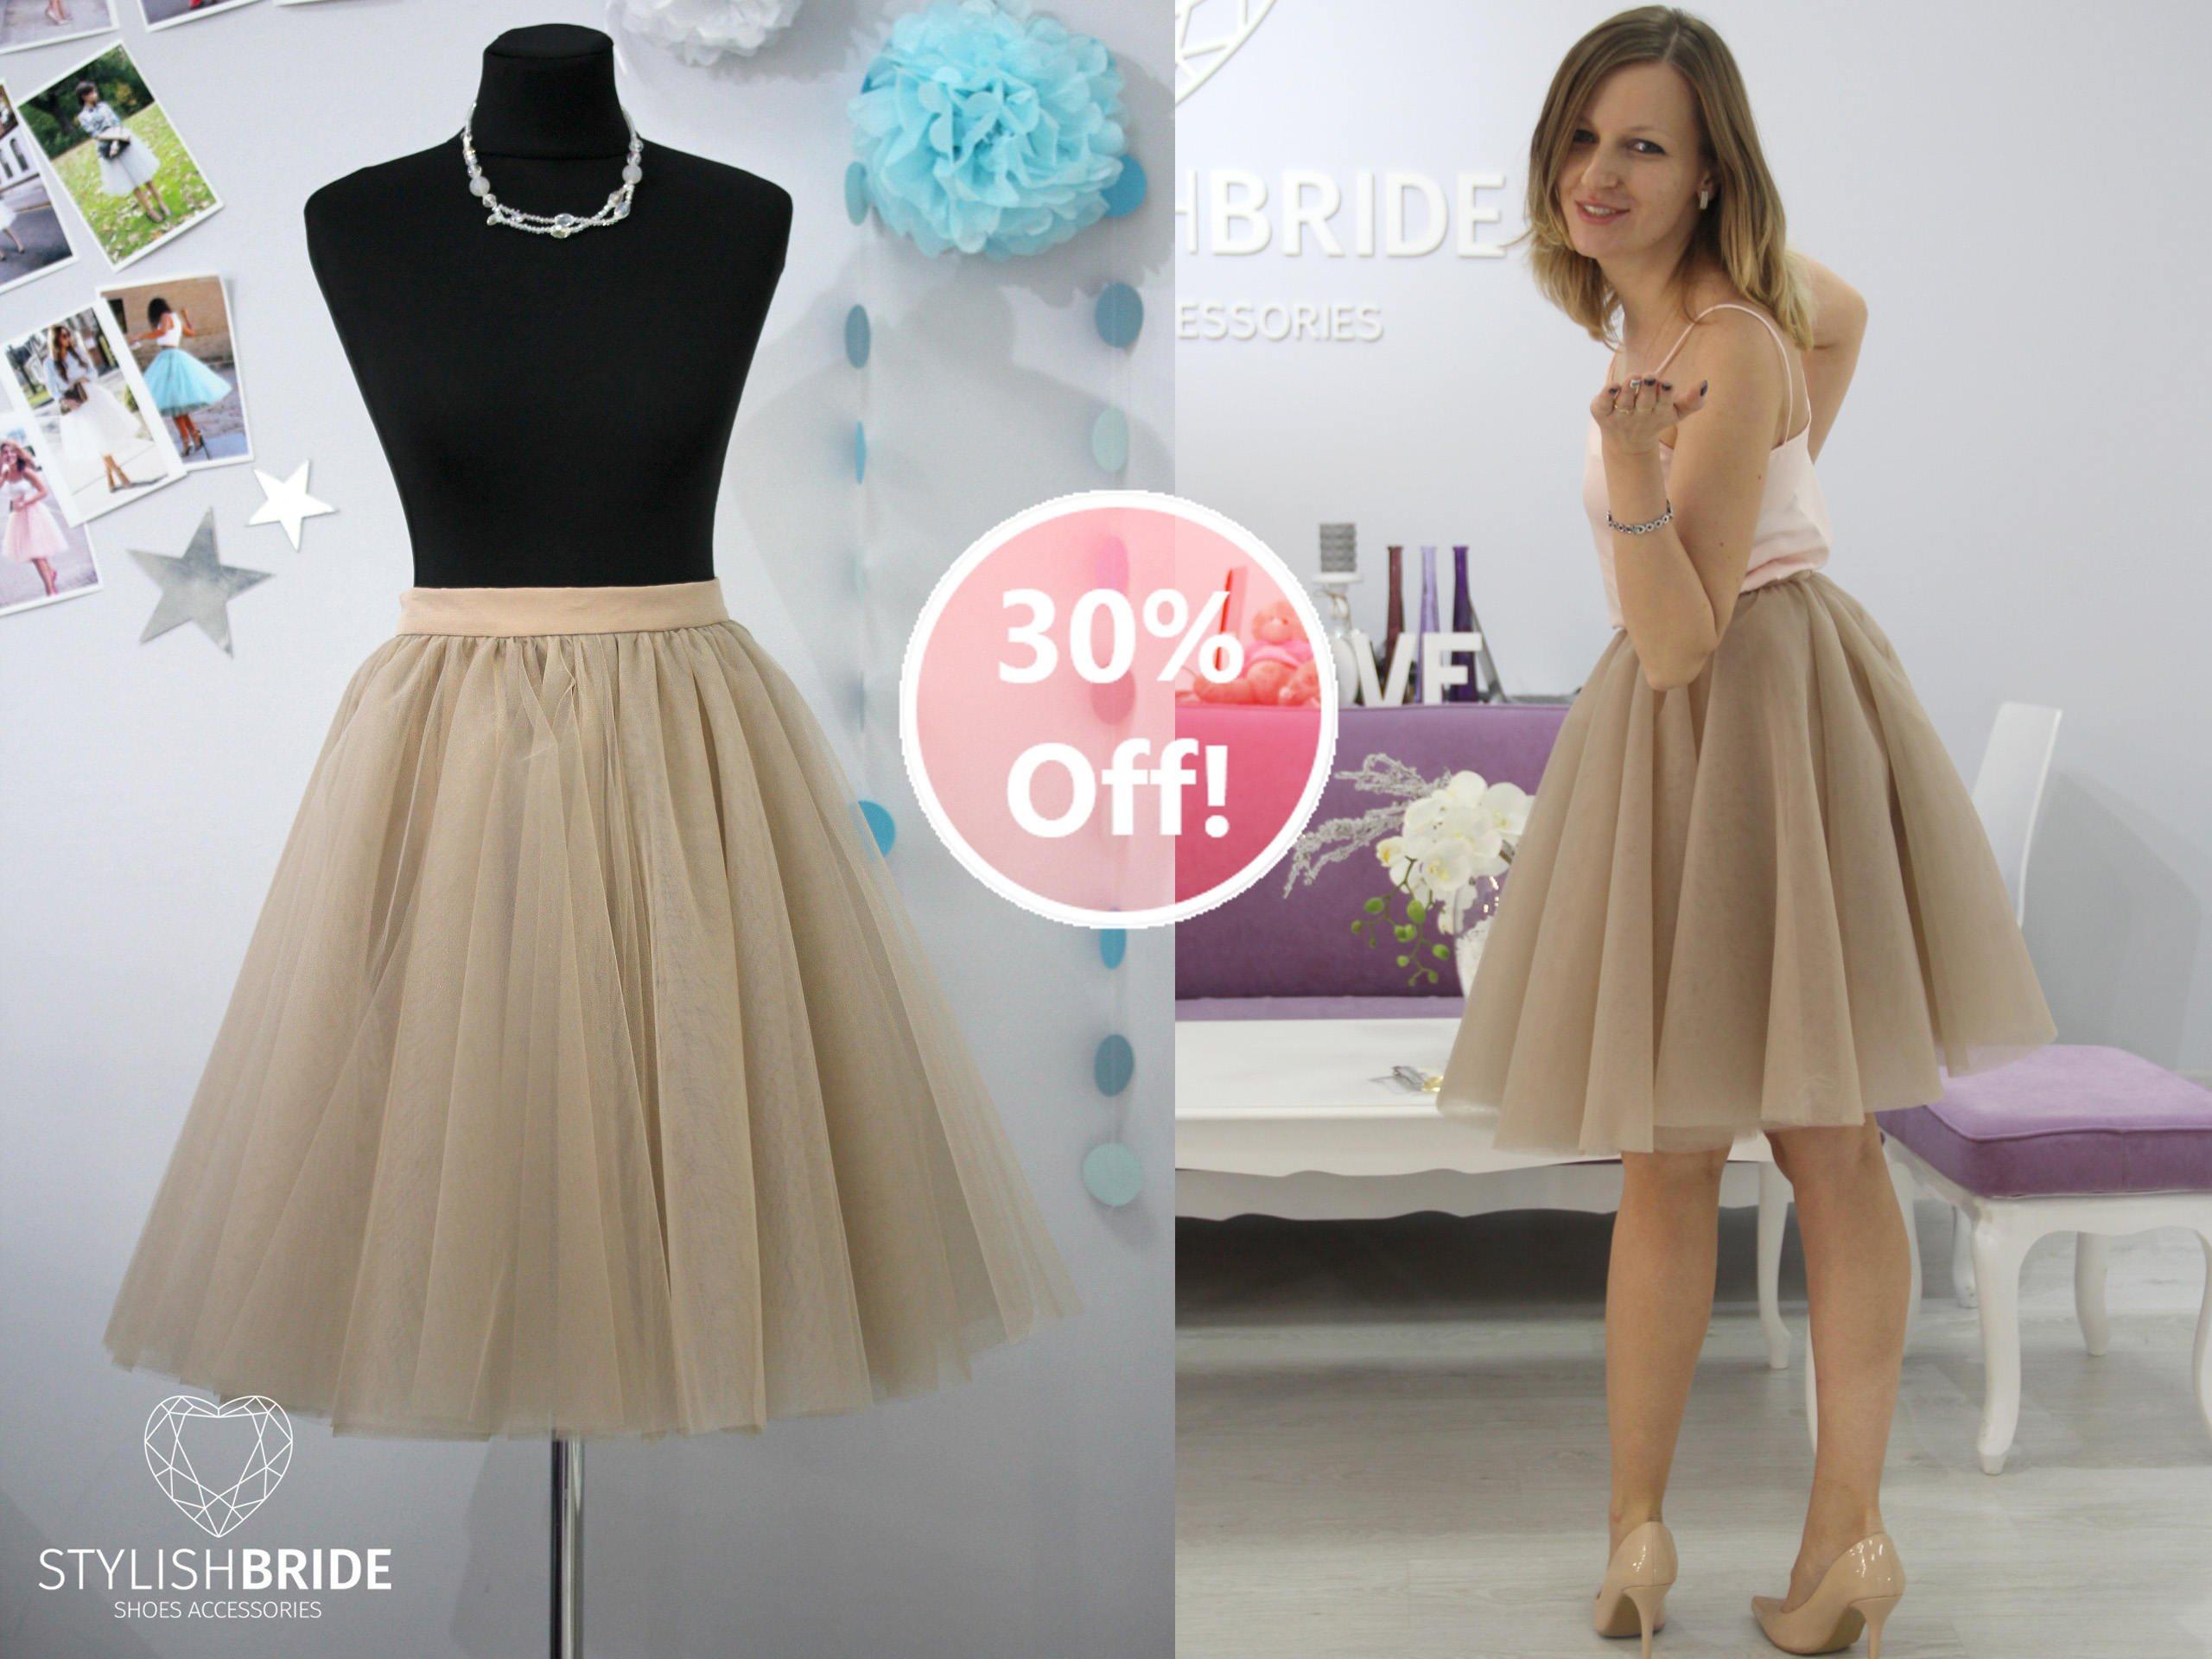 173 Sun Flared Women Taupe Super Lush Tulle Skirt, Tulle Skirt Bridal, Women Tulle Skirt, Princess Skirt, Wedding Tulle Skirt Silk Lining